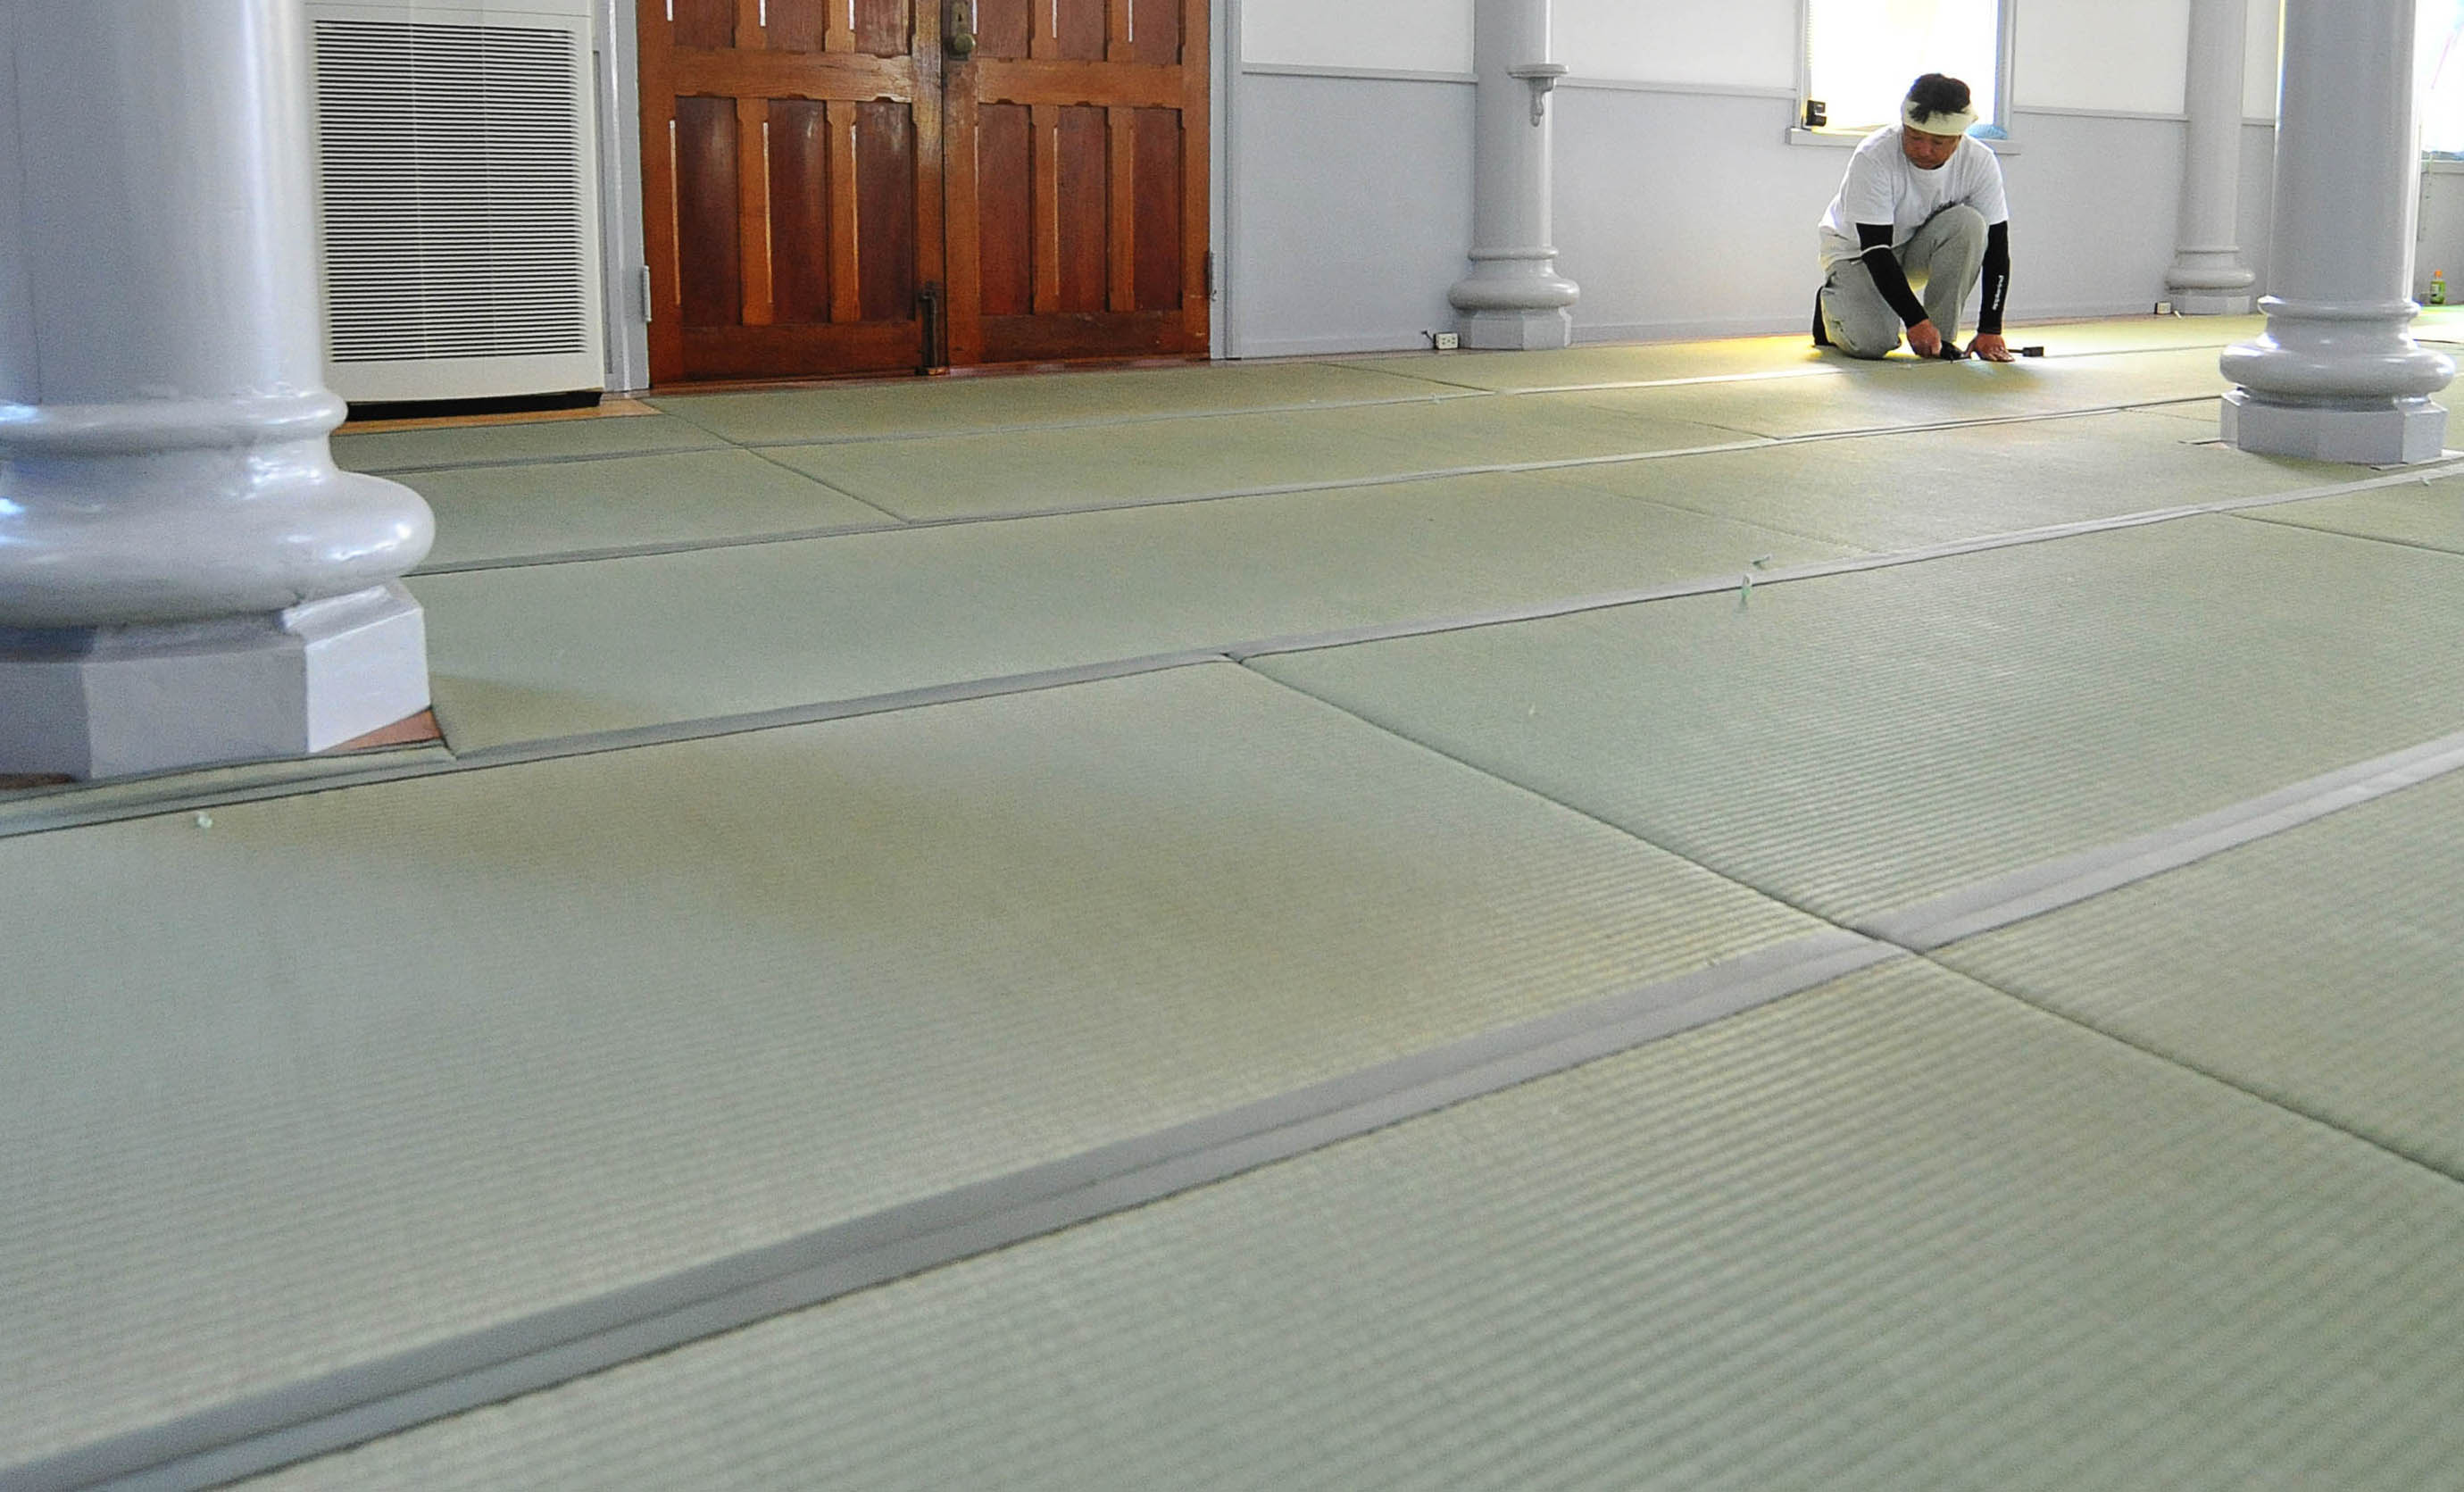 tatami stock mats villa yokokan sliding give historic screens fukui mat japanese at shoji sunny in of rooms matsudaira family photo view garden